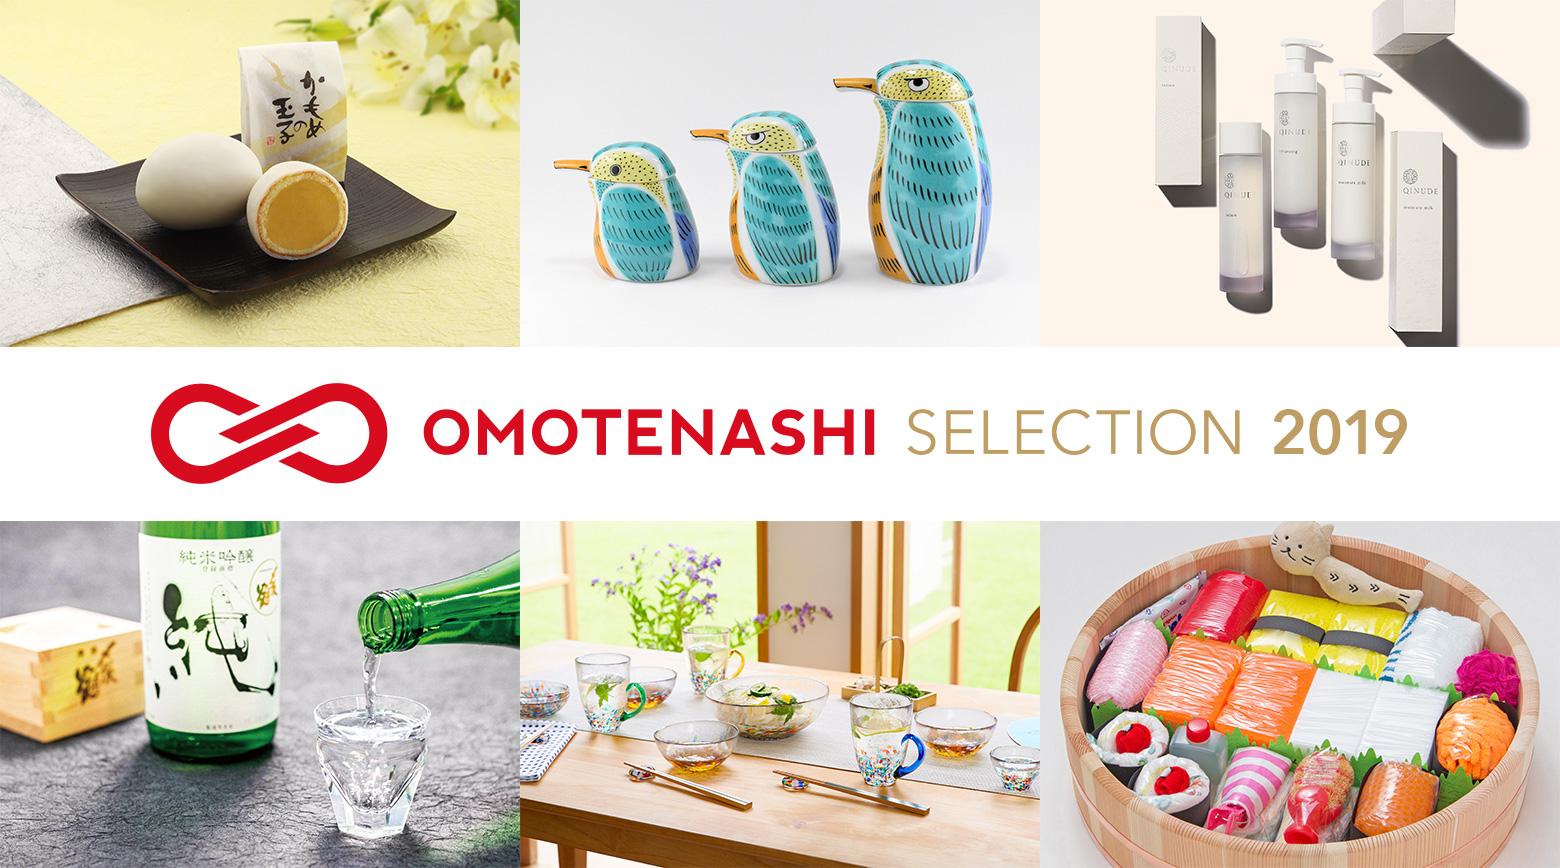 「OMOTENASHI Selection 2019」金賞28対象・特別賞7対象を含む、全103の受賞対象が決定!!